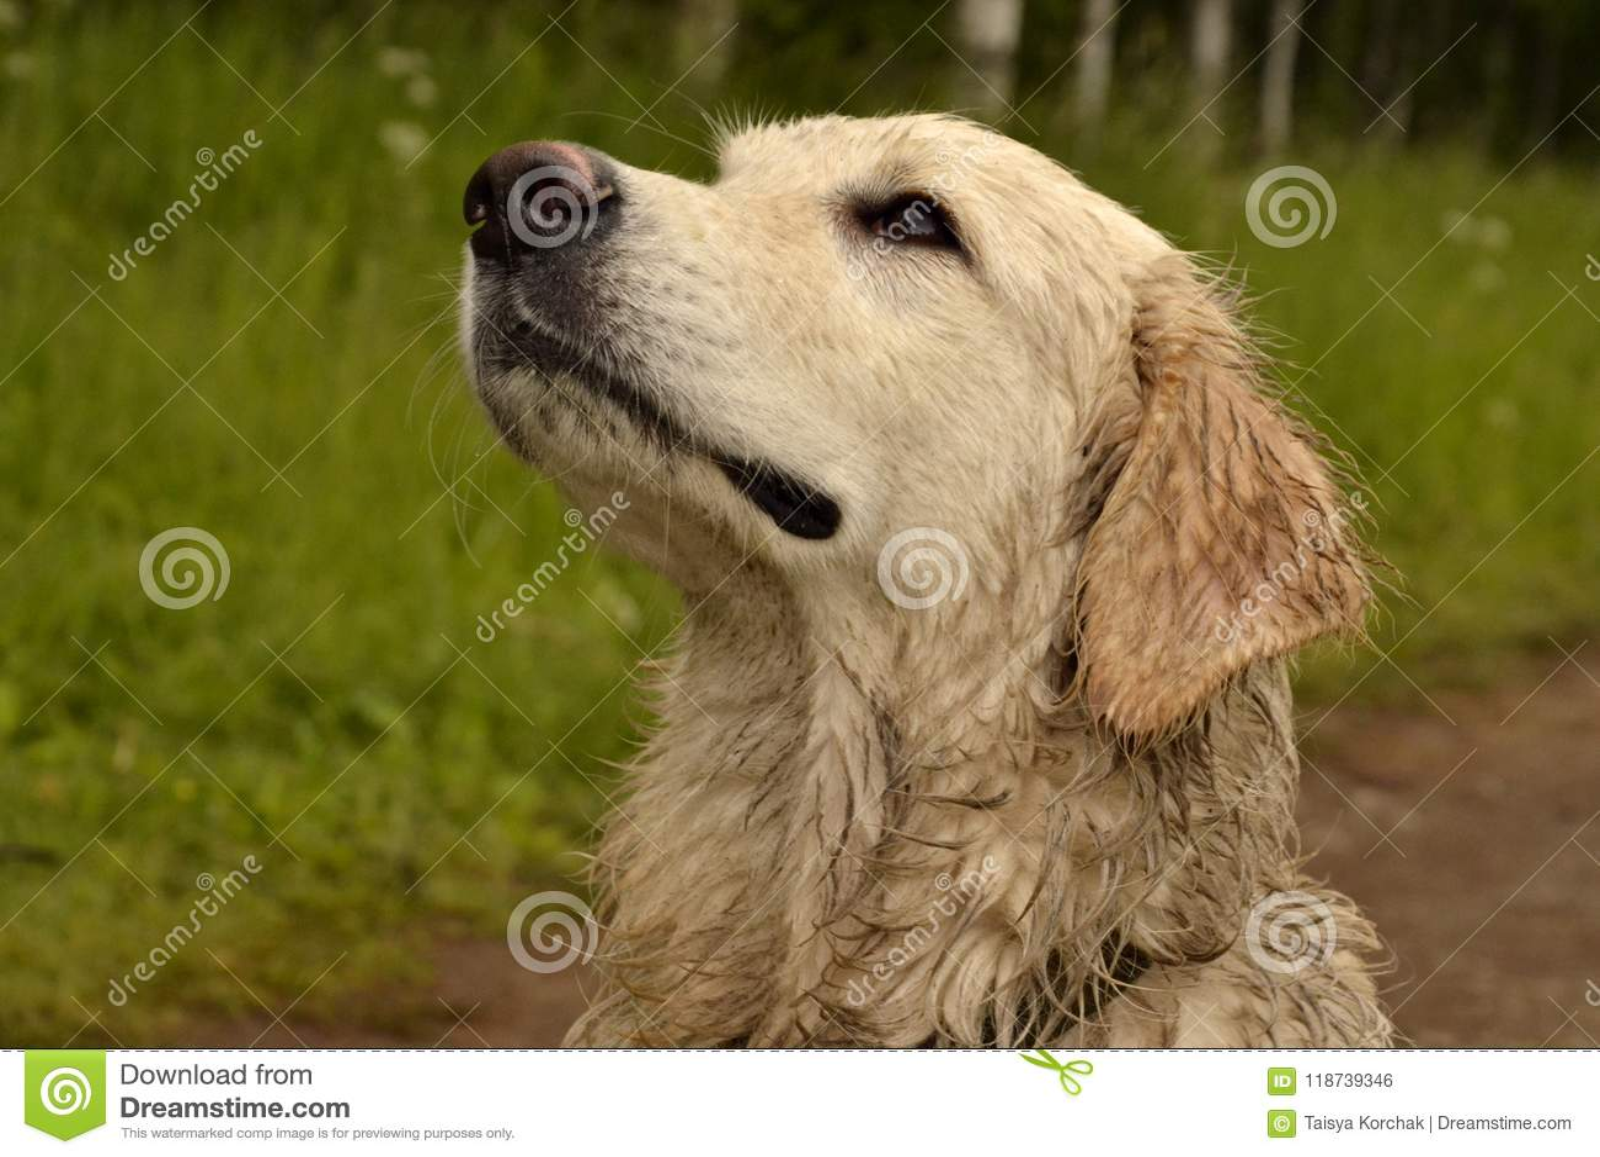 Labrador Puppy Stock Photo Image Of Breeding Golden 118739346